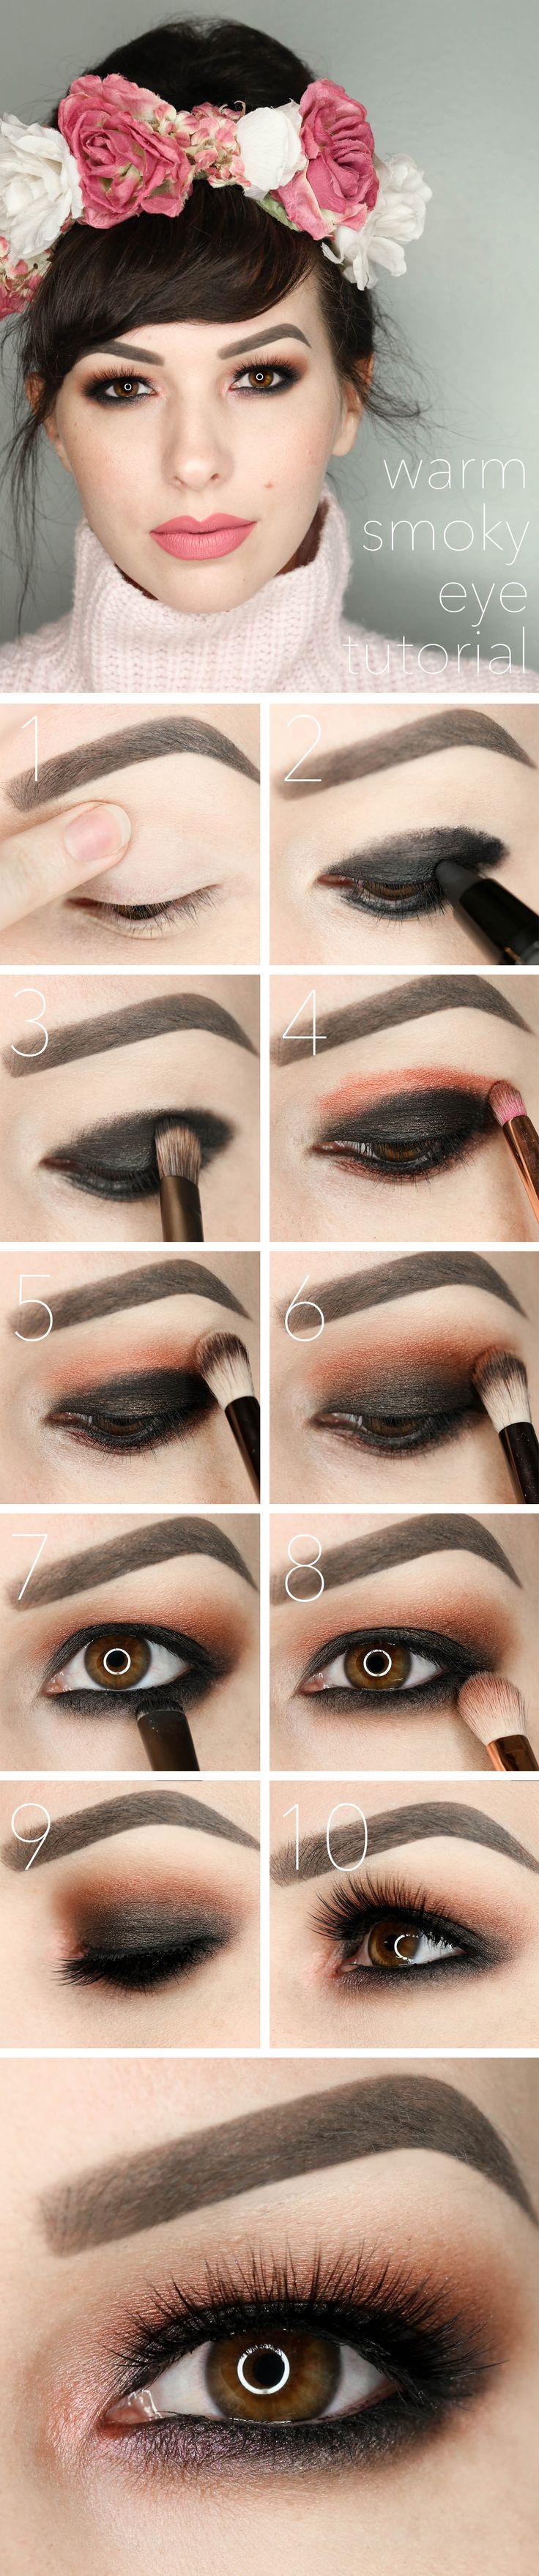 Best ideas for makeup tutorials warm smoky eye tutorial description warm smoky eye tutorial valentines day makeup baditri Choice Image